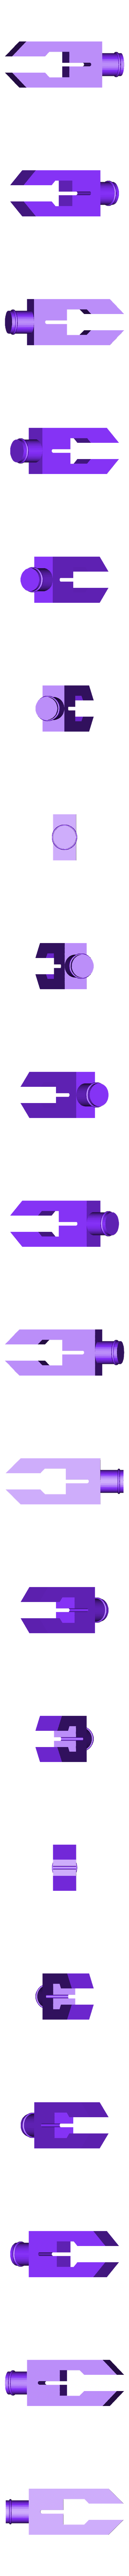 sujeta destornillador.STL Download free STL file soporte destornillador • 3D printing model, Thinking3Dthings